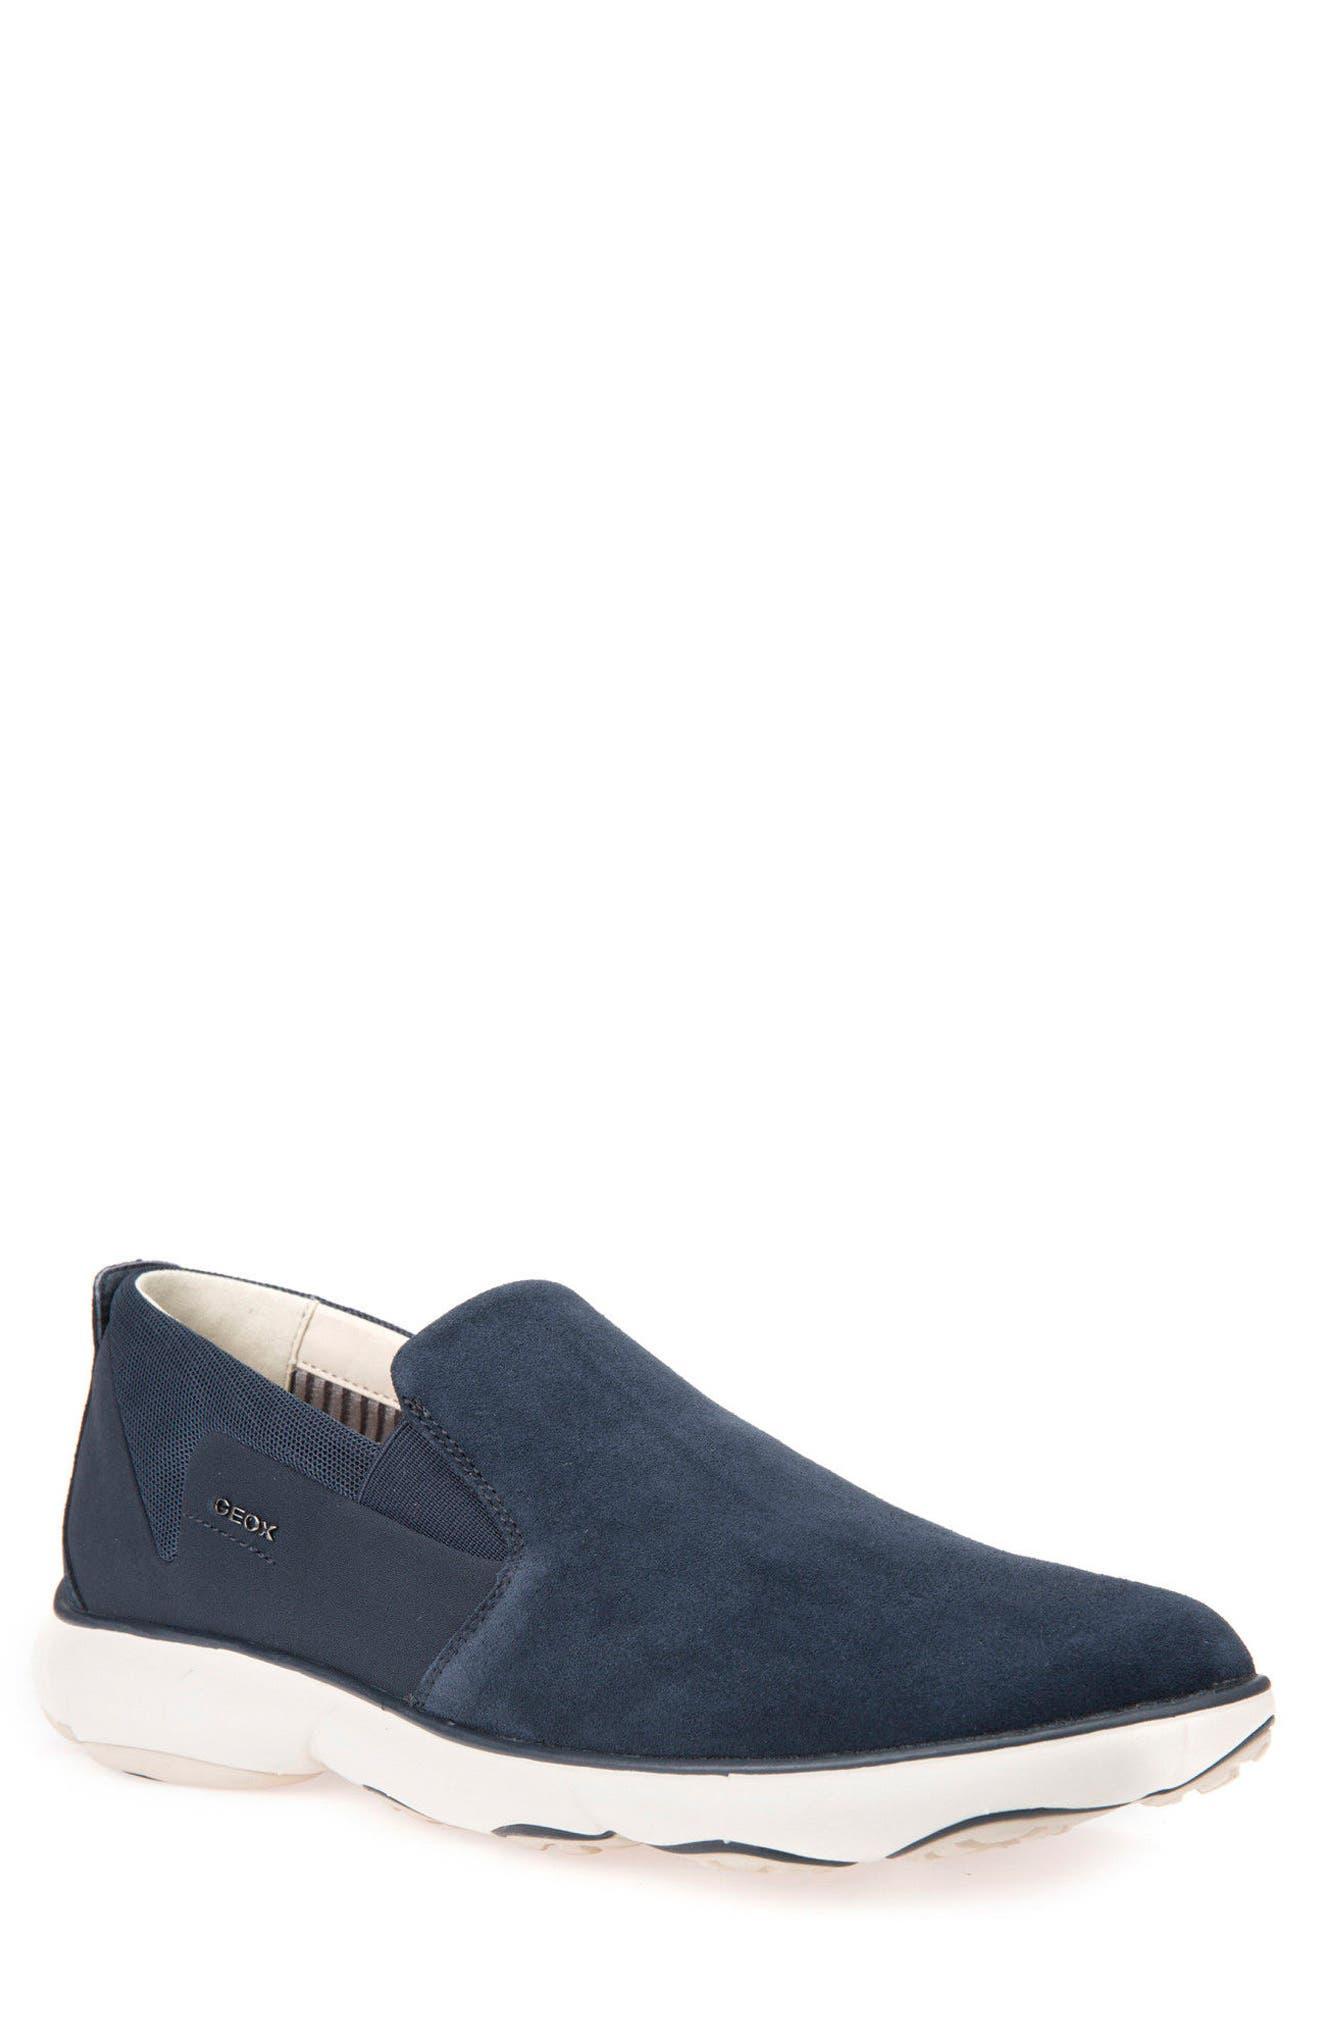 Nebula 44 Slip-On Sneaker,                         Main,                         color, Navy